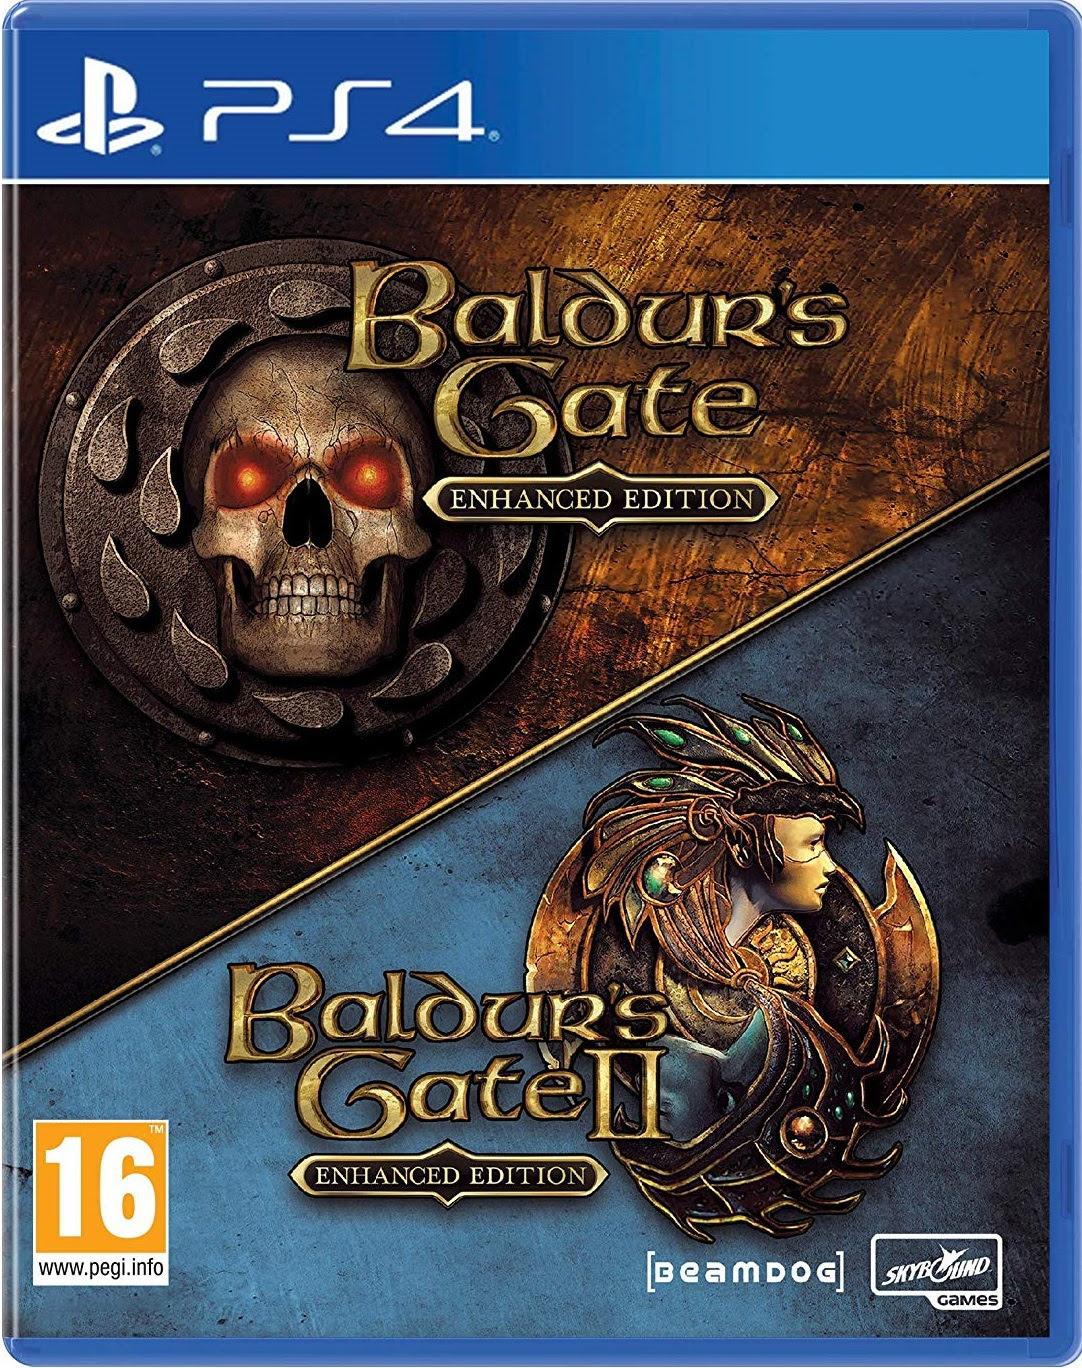 Baldur's gate 1 & 2 enhanced edition